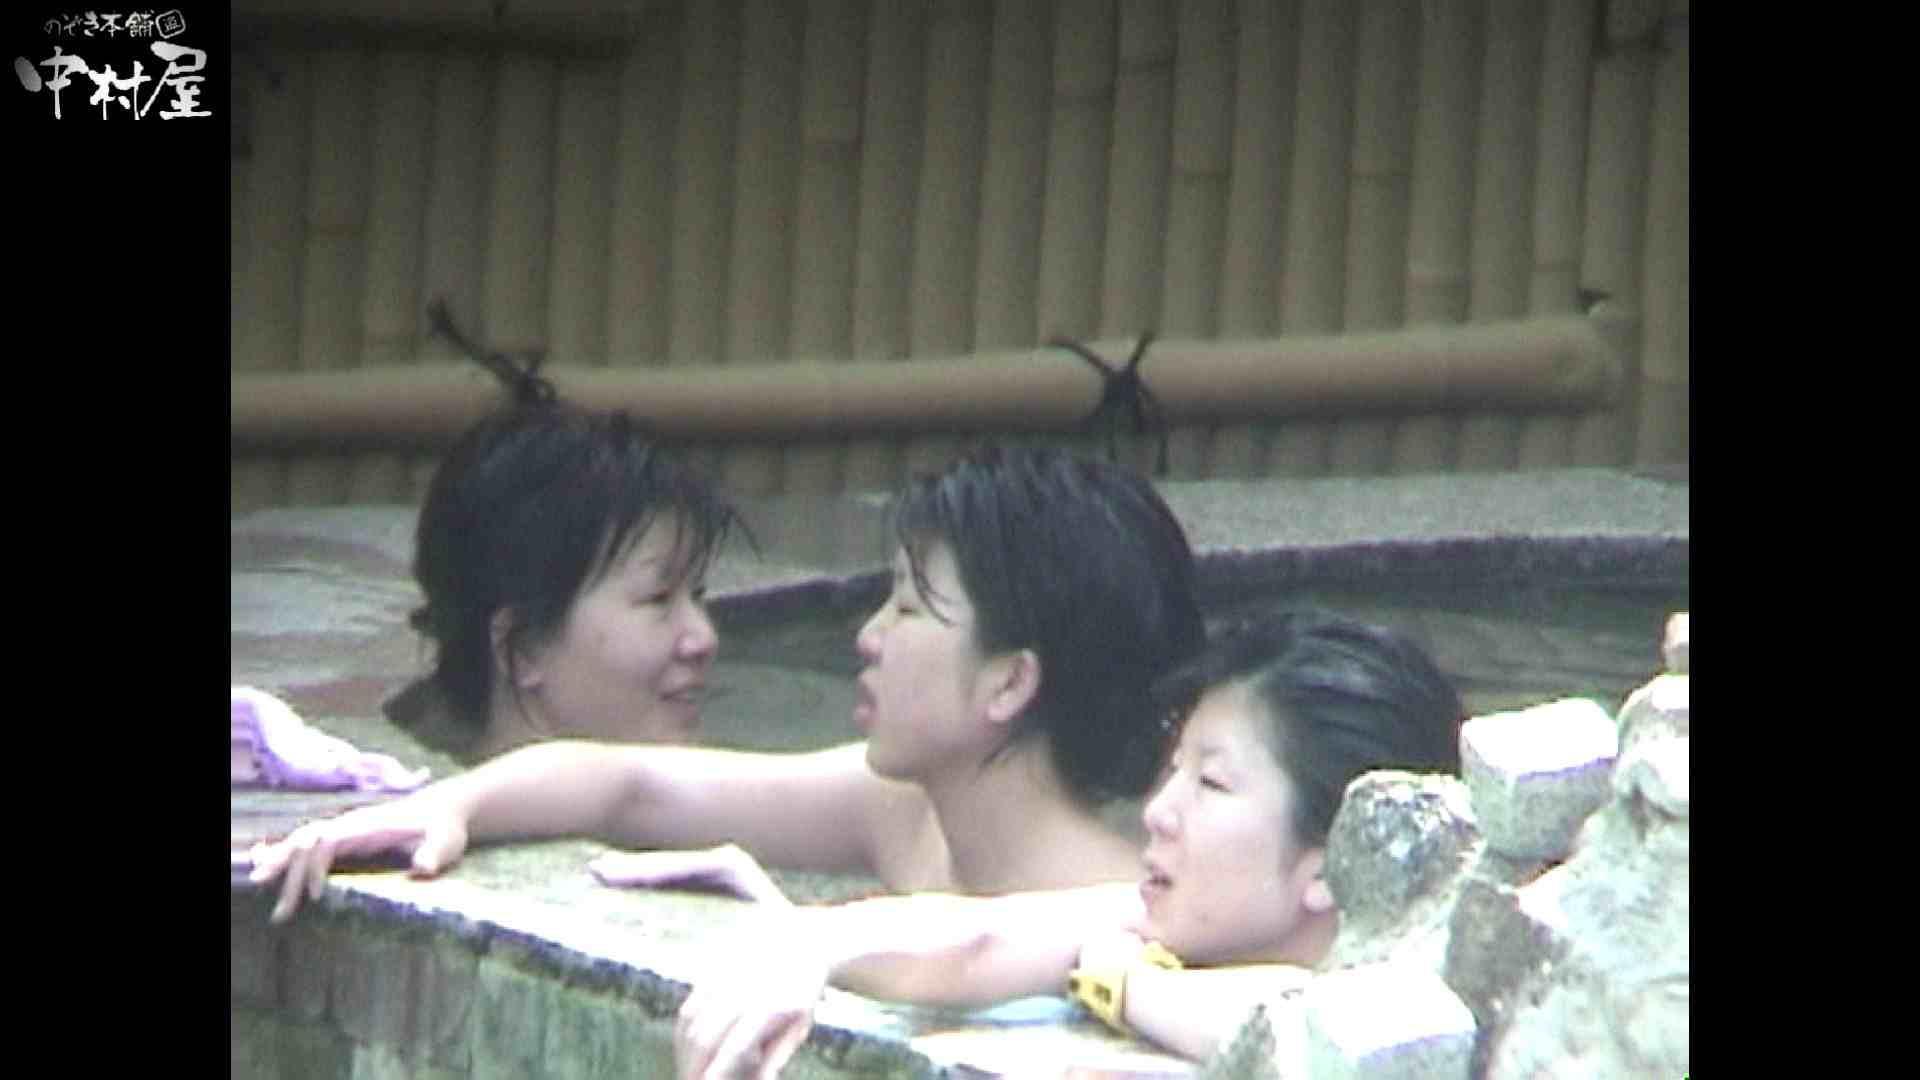 Aquaな露天風呂Vol.936 盗撮映像  110Pix 67